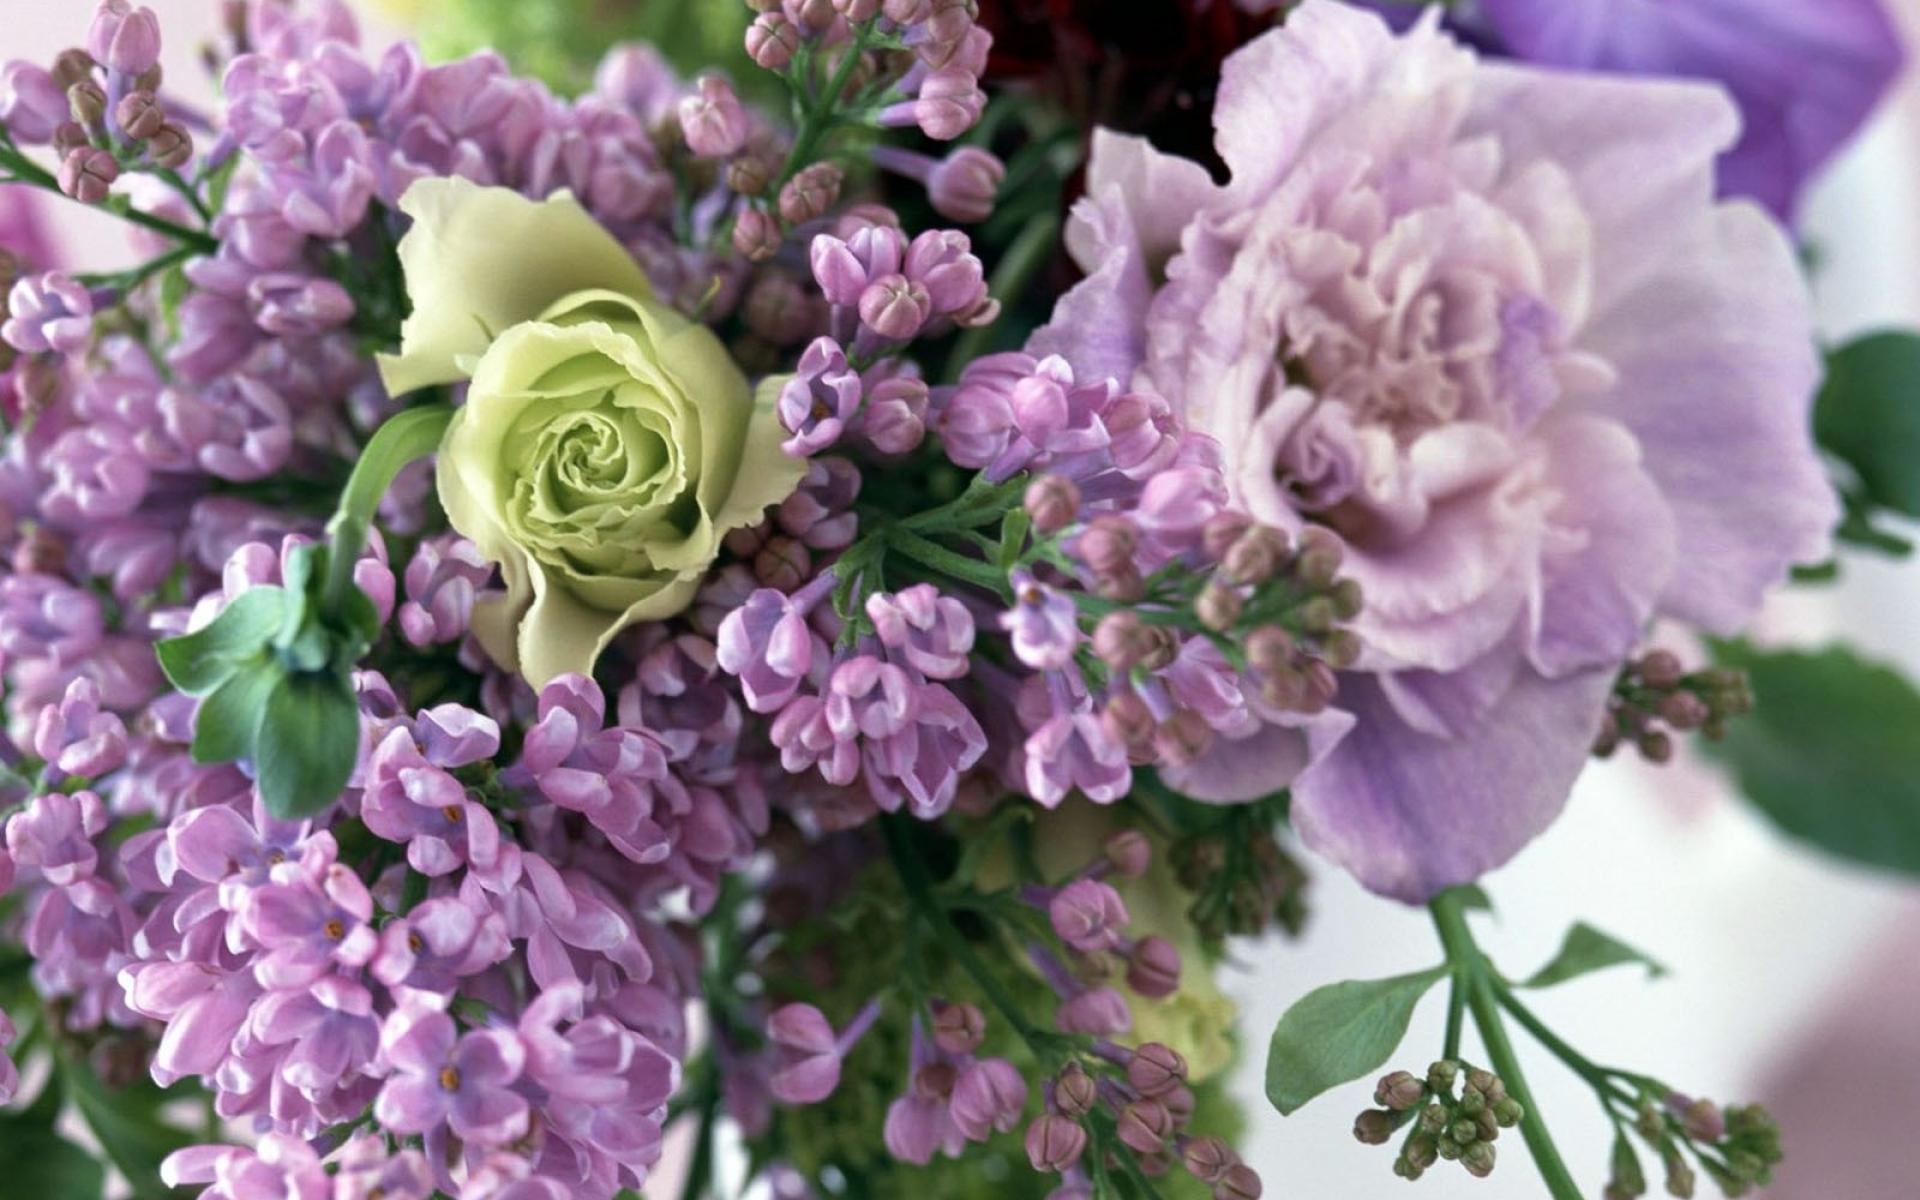 Картинки Роза, цветок, сирень, букет, весна фото и обои на рабочий стол